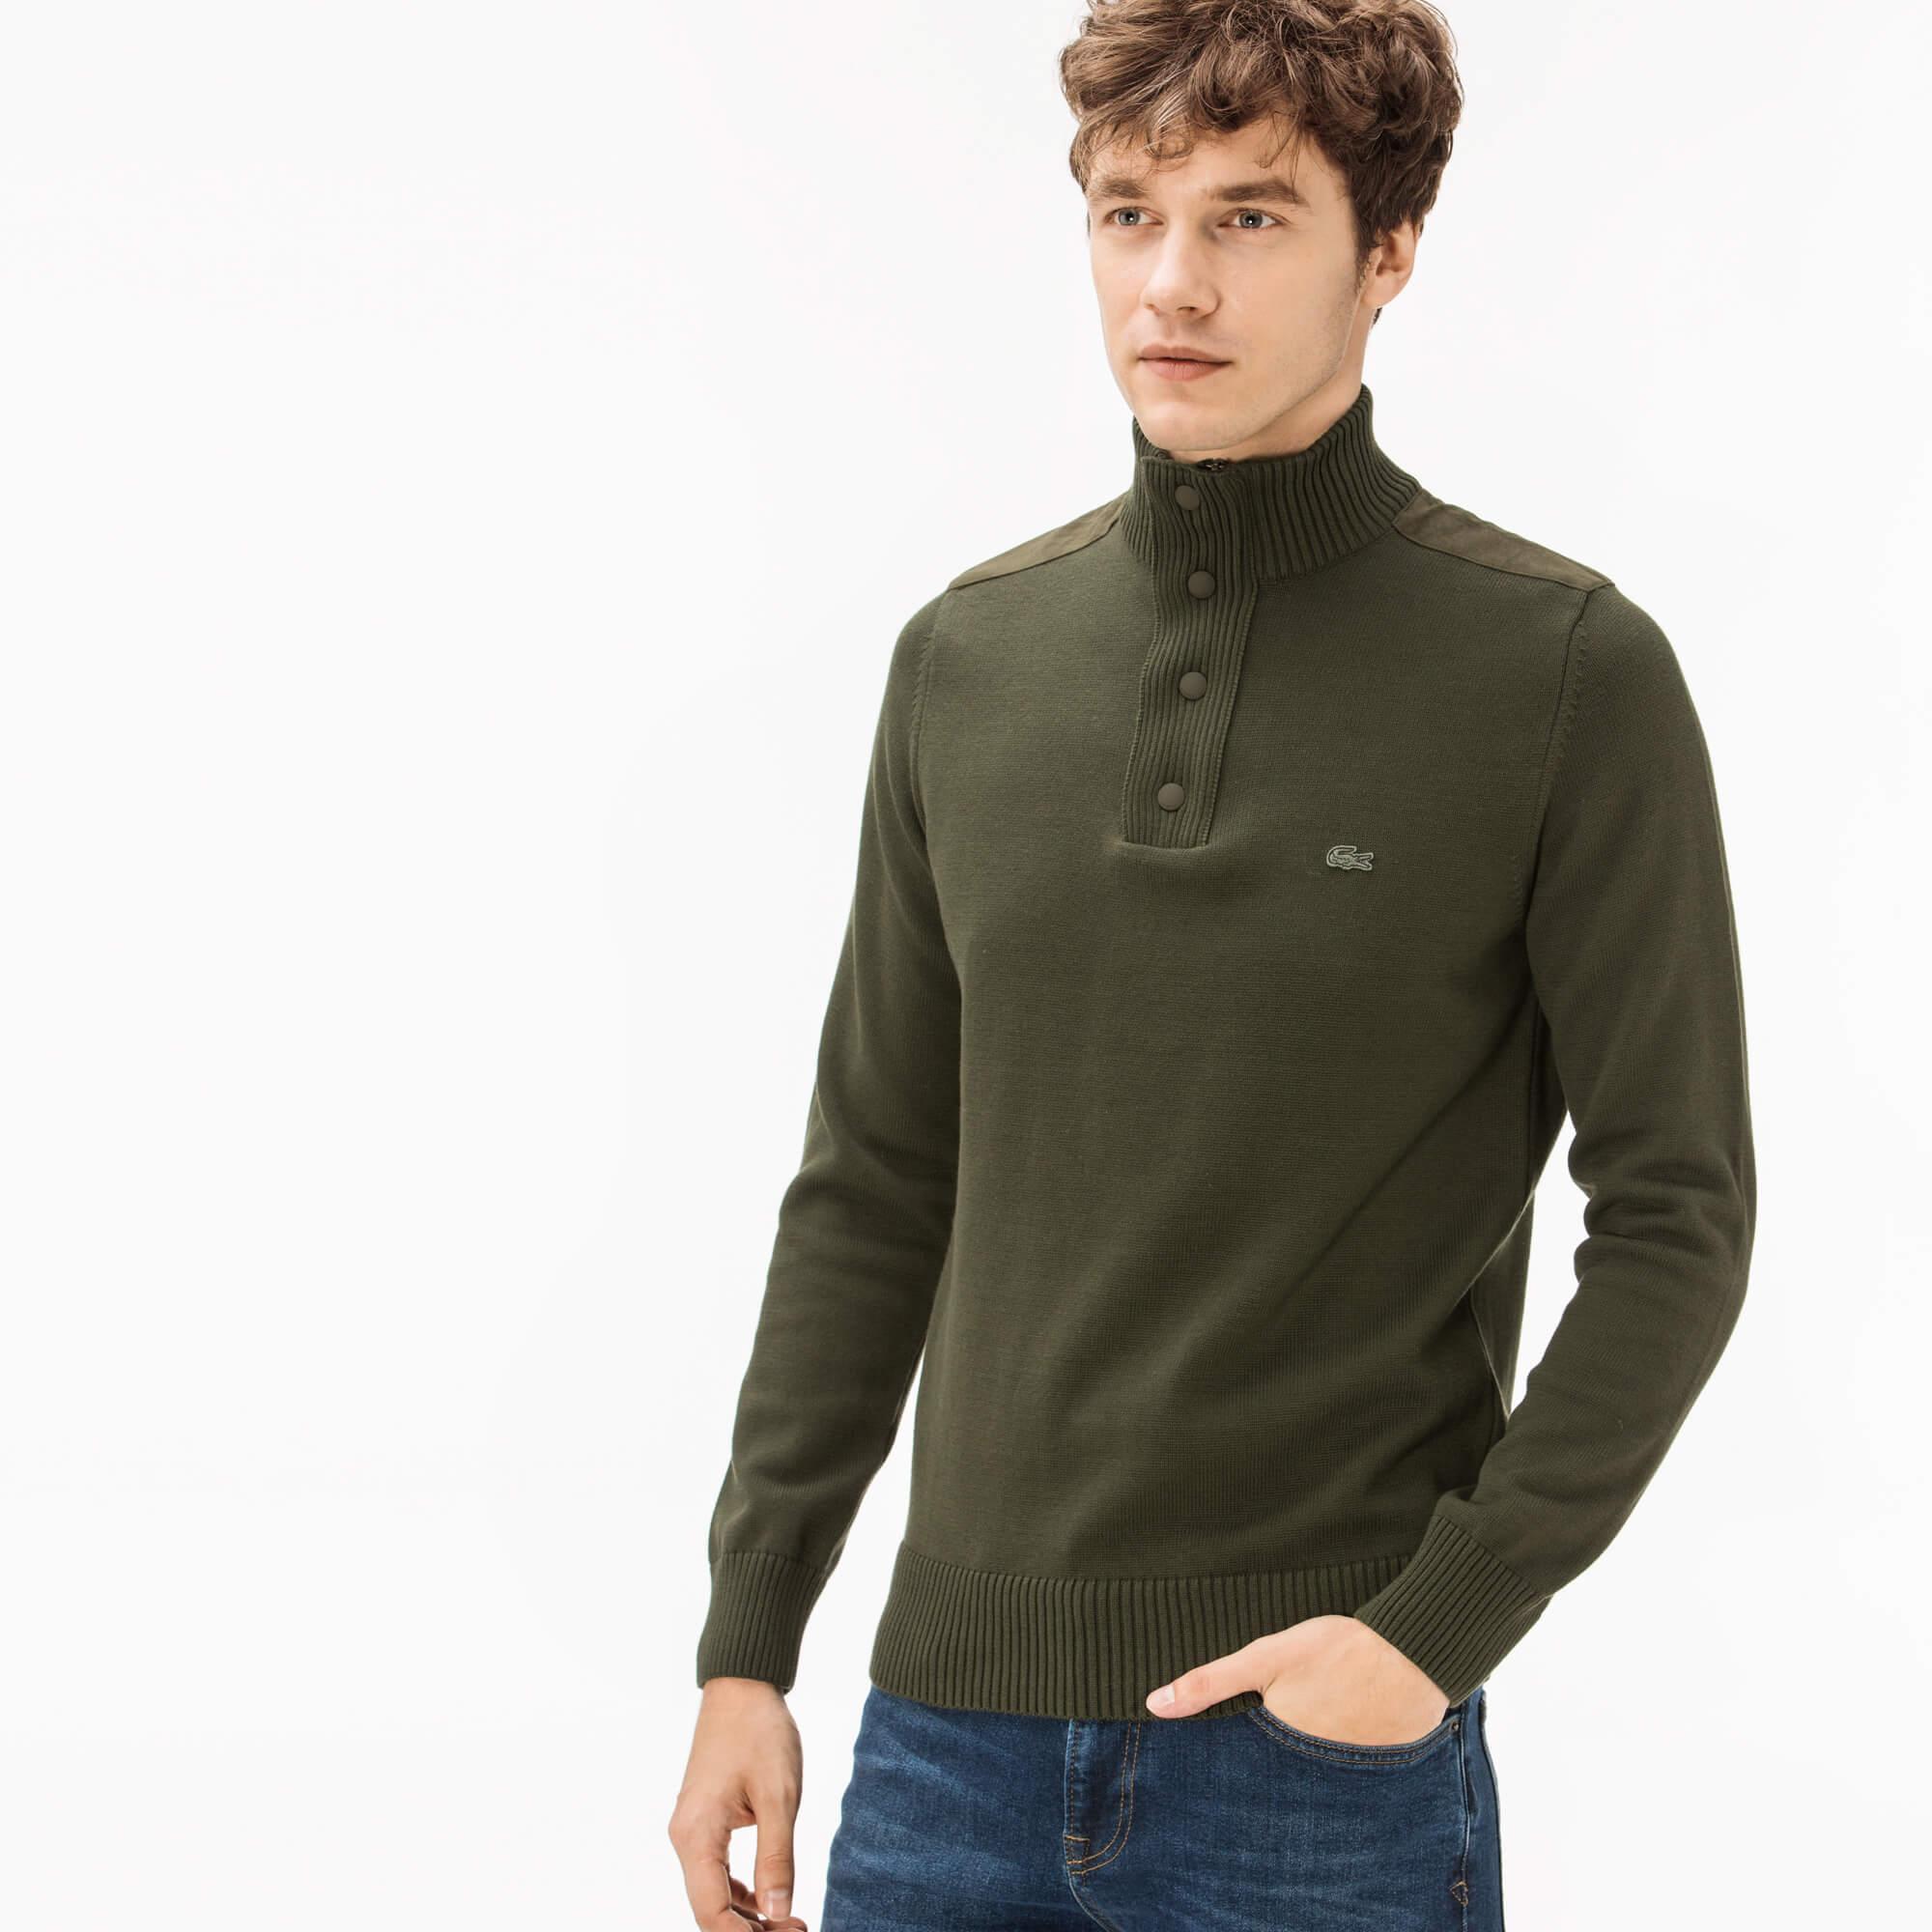 Фото 2 - Мужской свитер Lacoste зеленого цвета